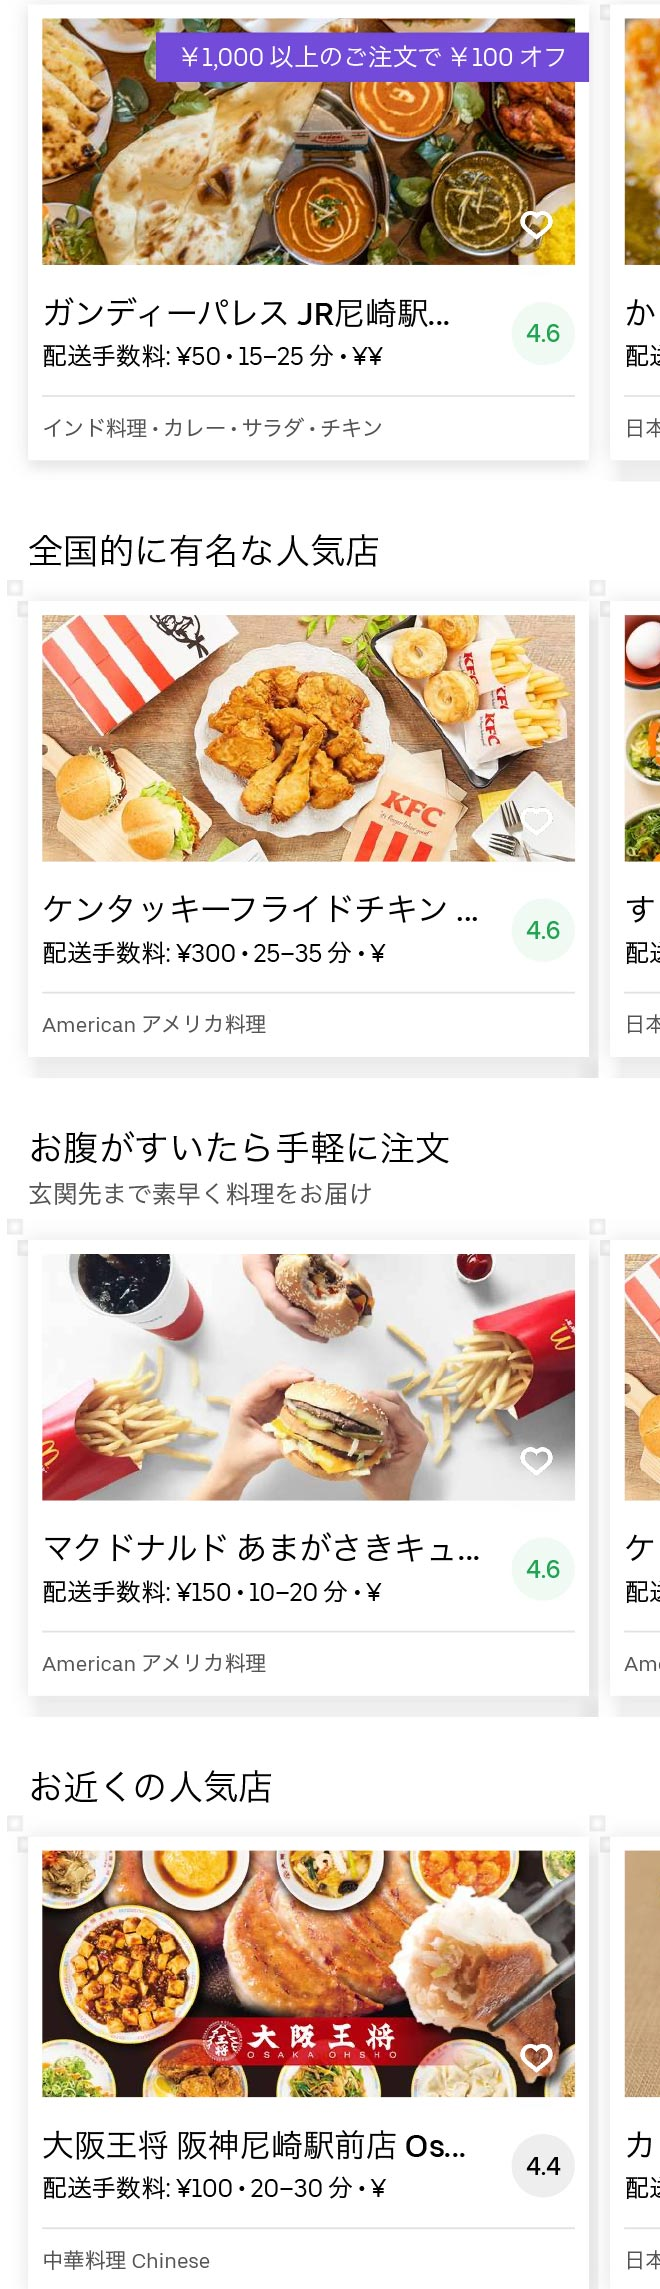 Amagasaki menu 2005 01